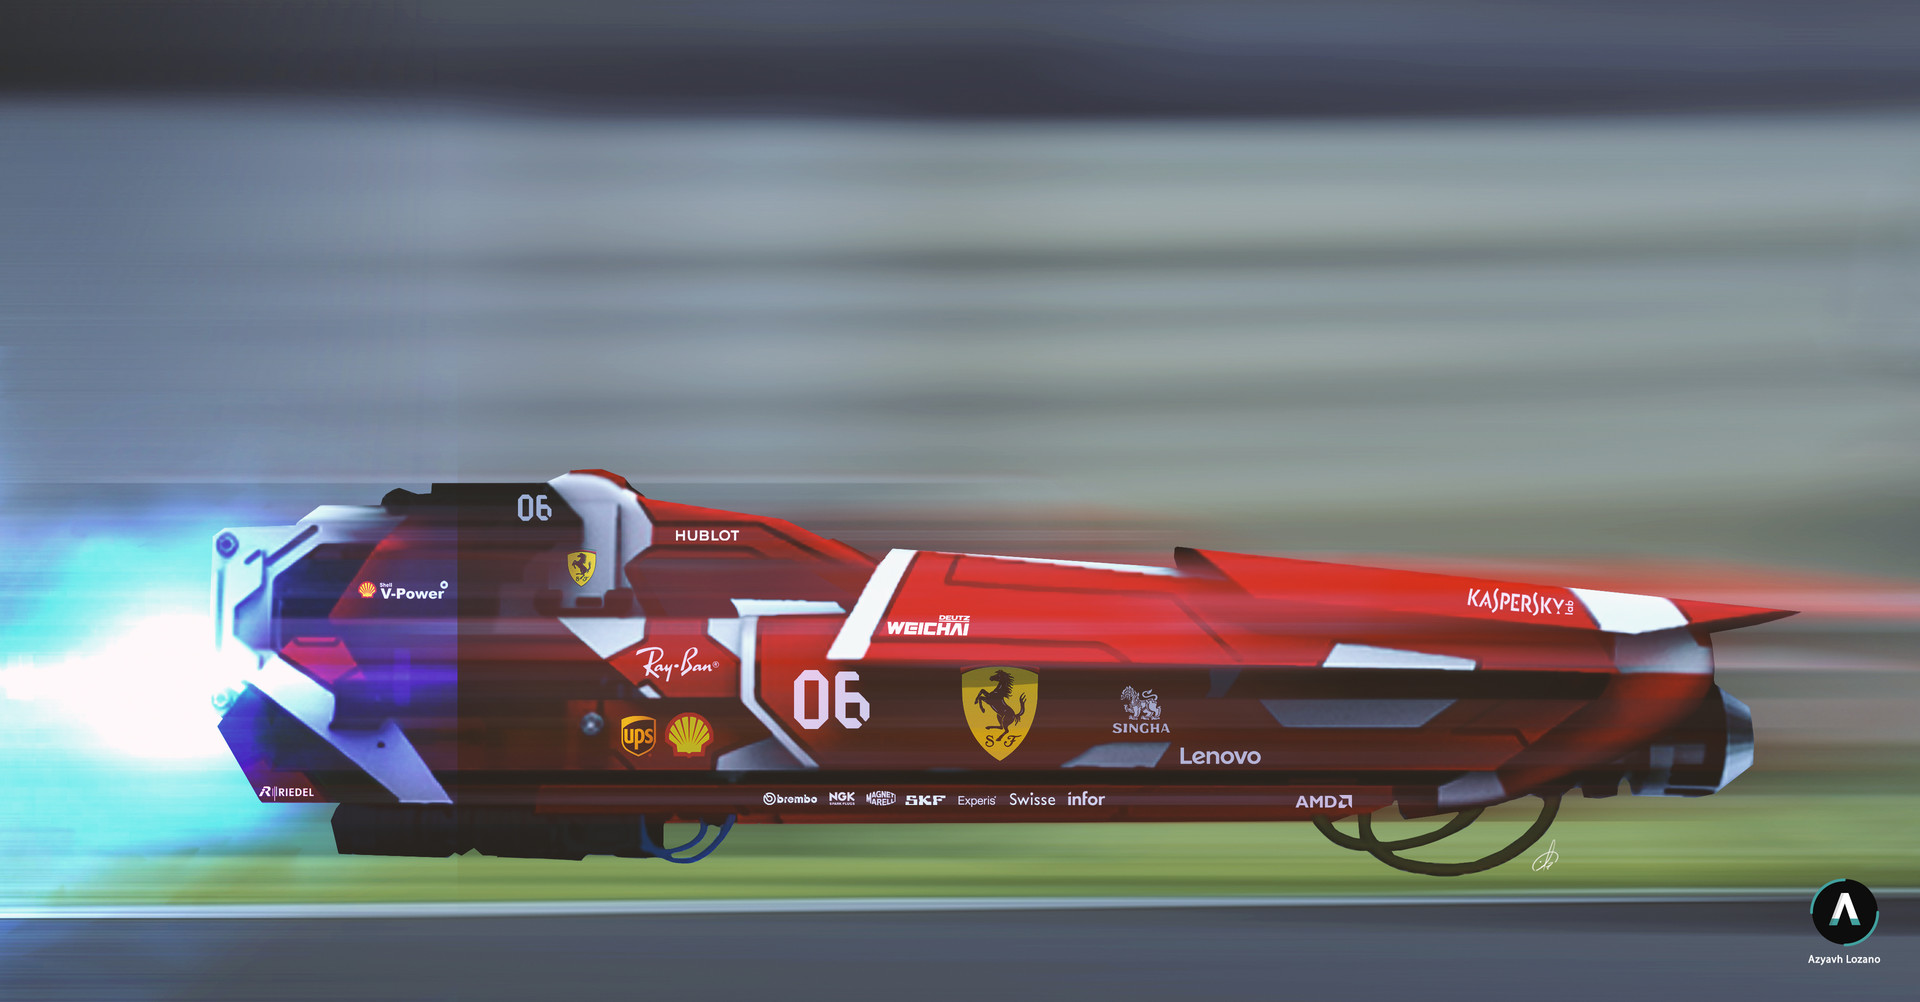 ArtStation , Ferrari 2099 Concept Art , Azriel Lozano